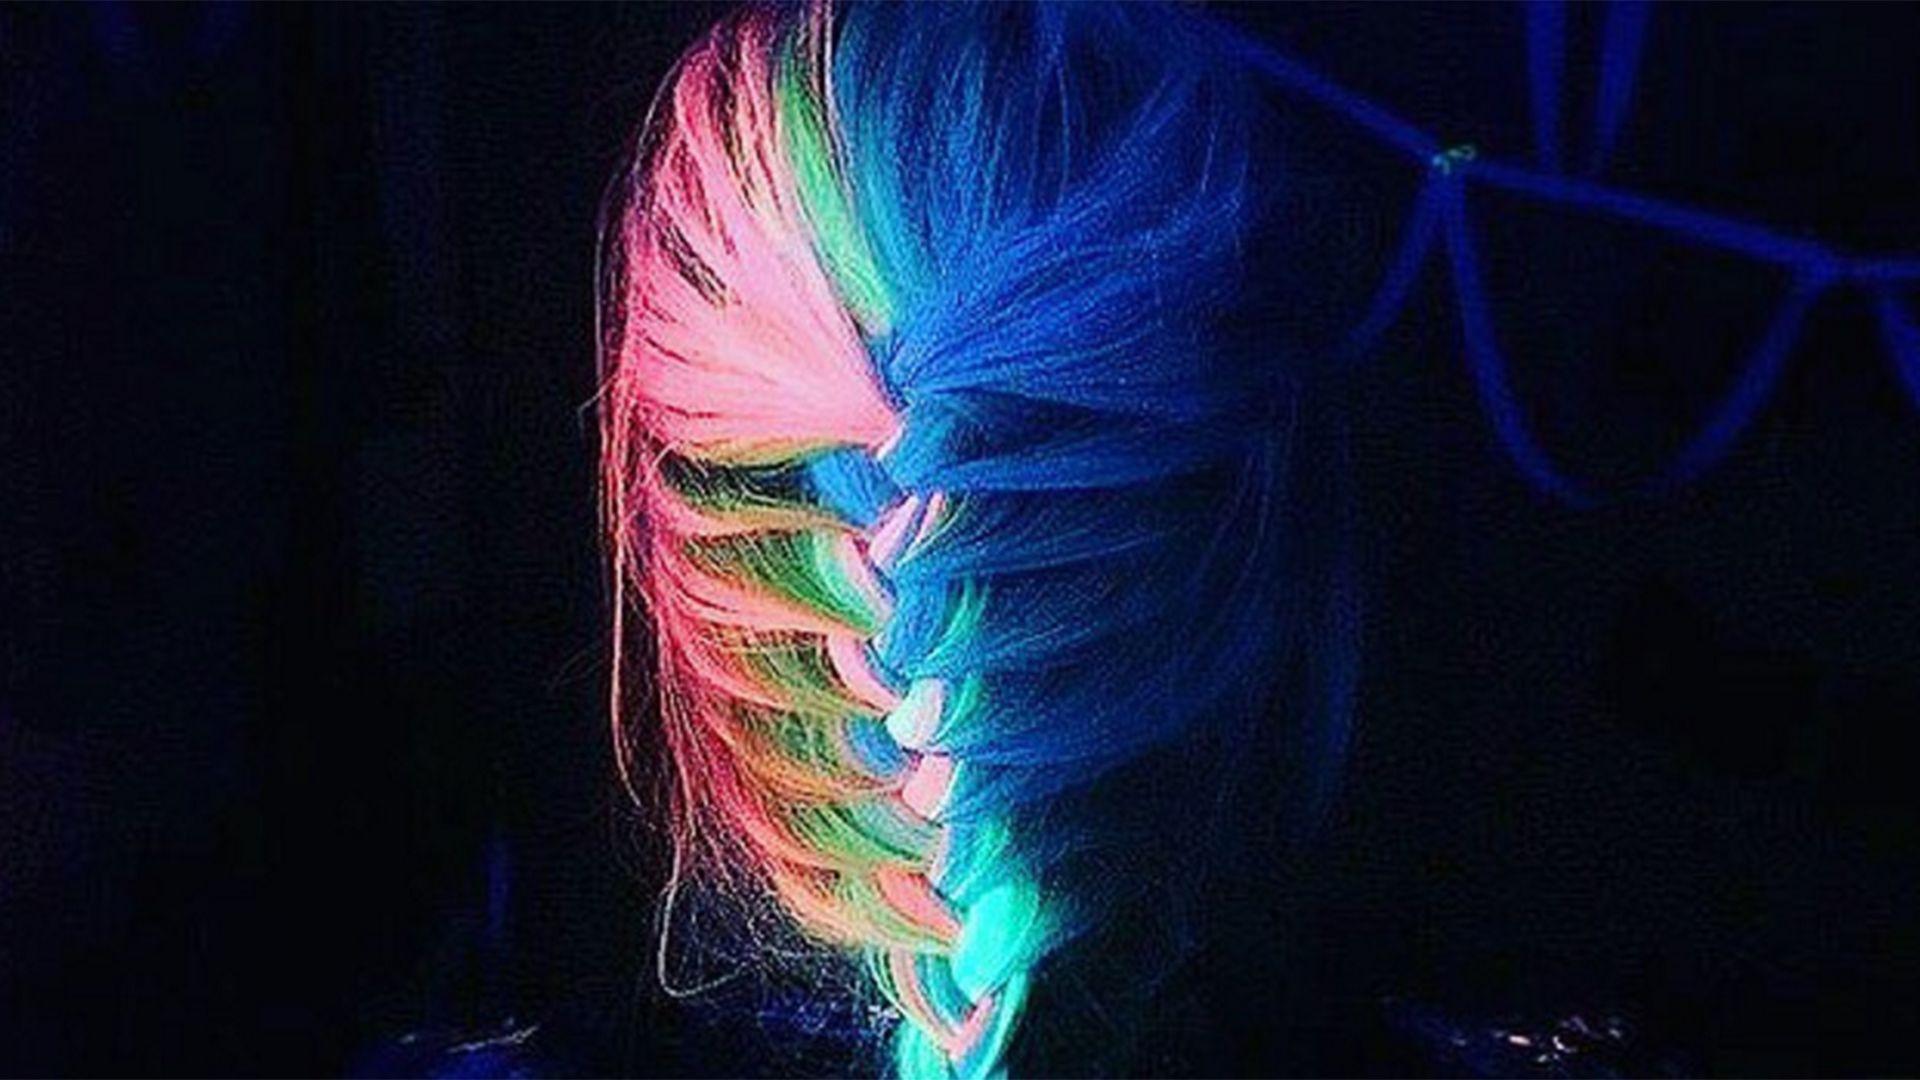 Rainbow Glow Wallpapers - Wallpaper Cave